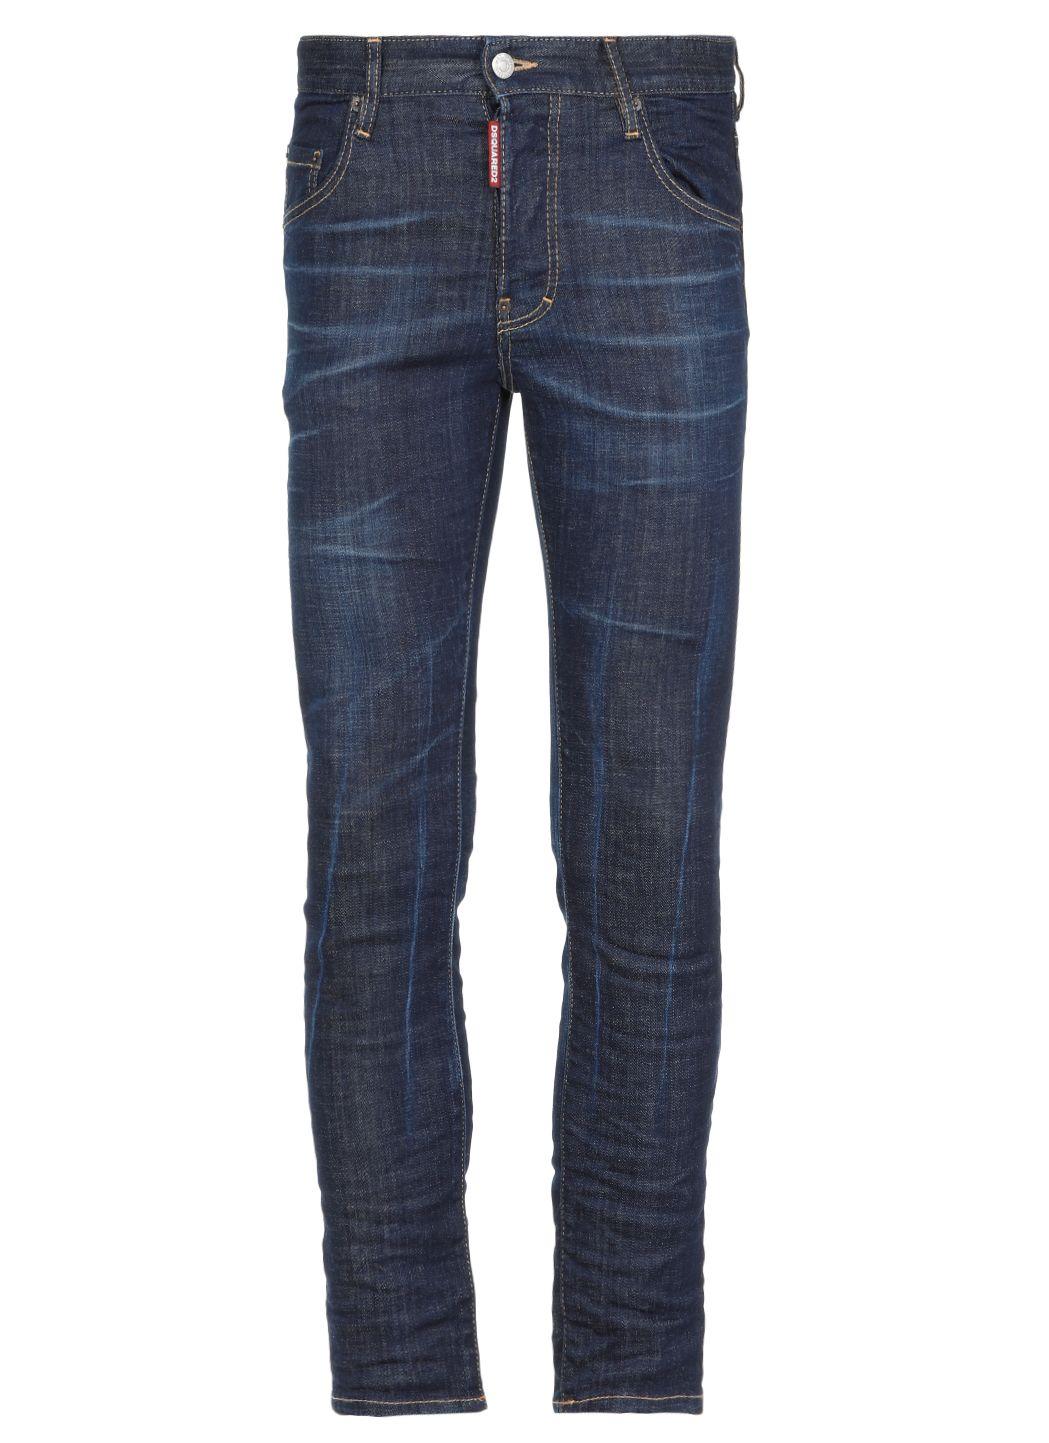 Dark 3 Wash Skater Jeans